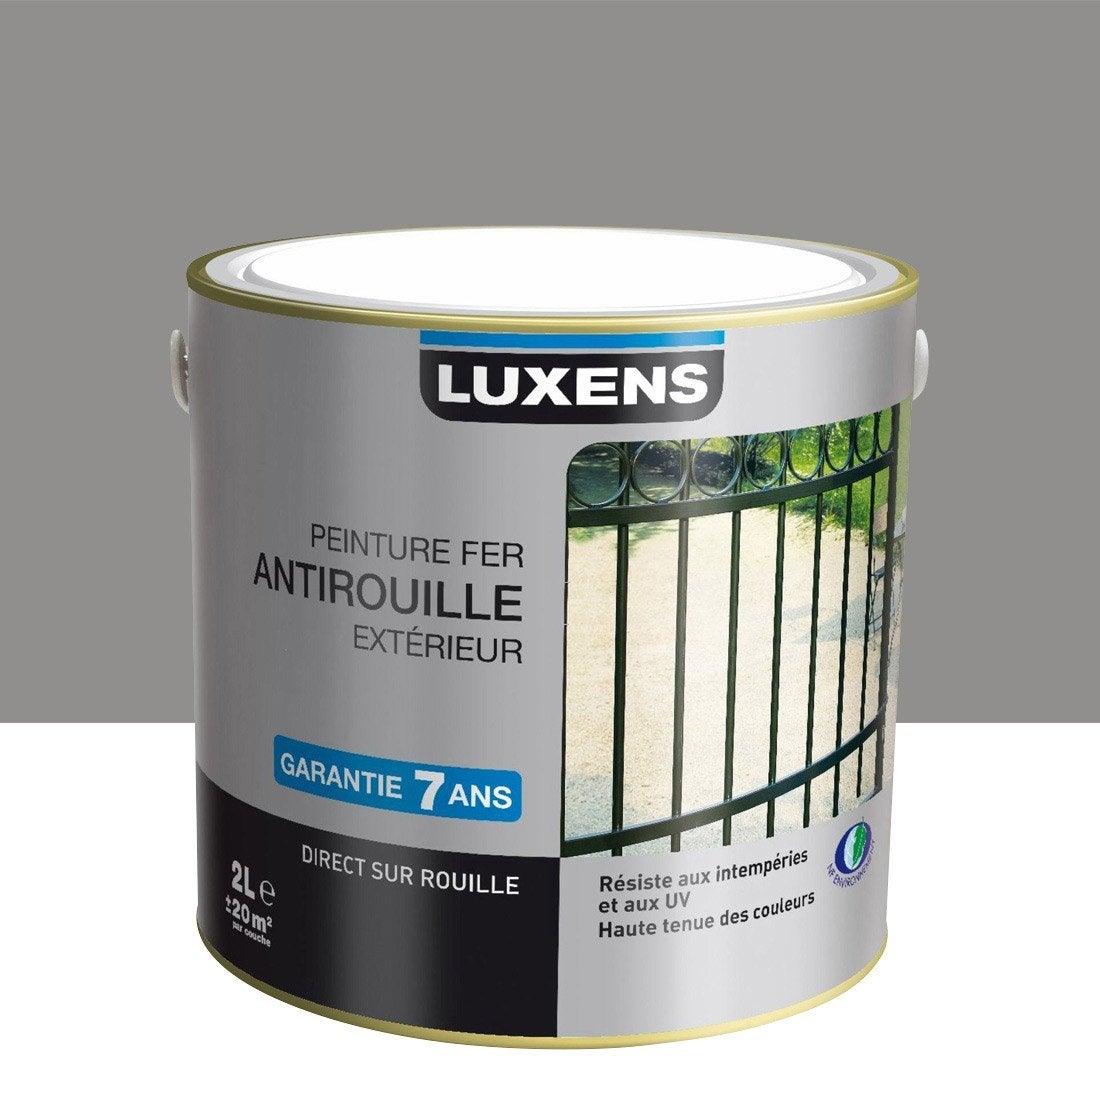 Peinture fer ext rieur antirouille luxens gris galet n 3 for Antirouille maison